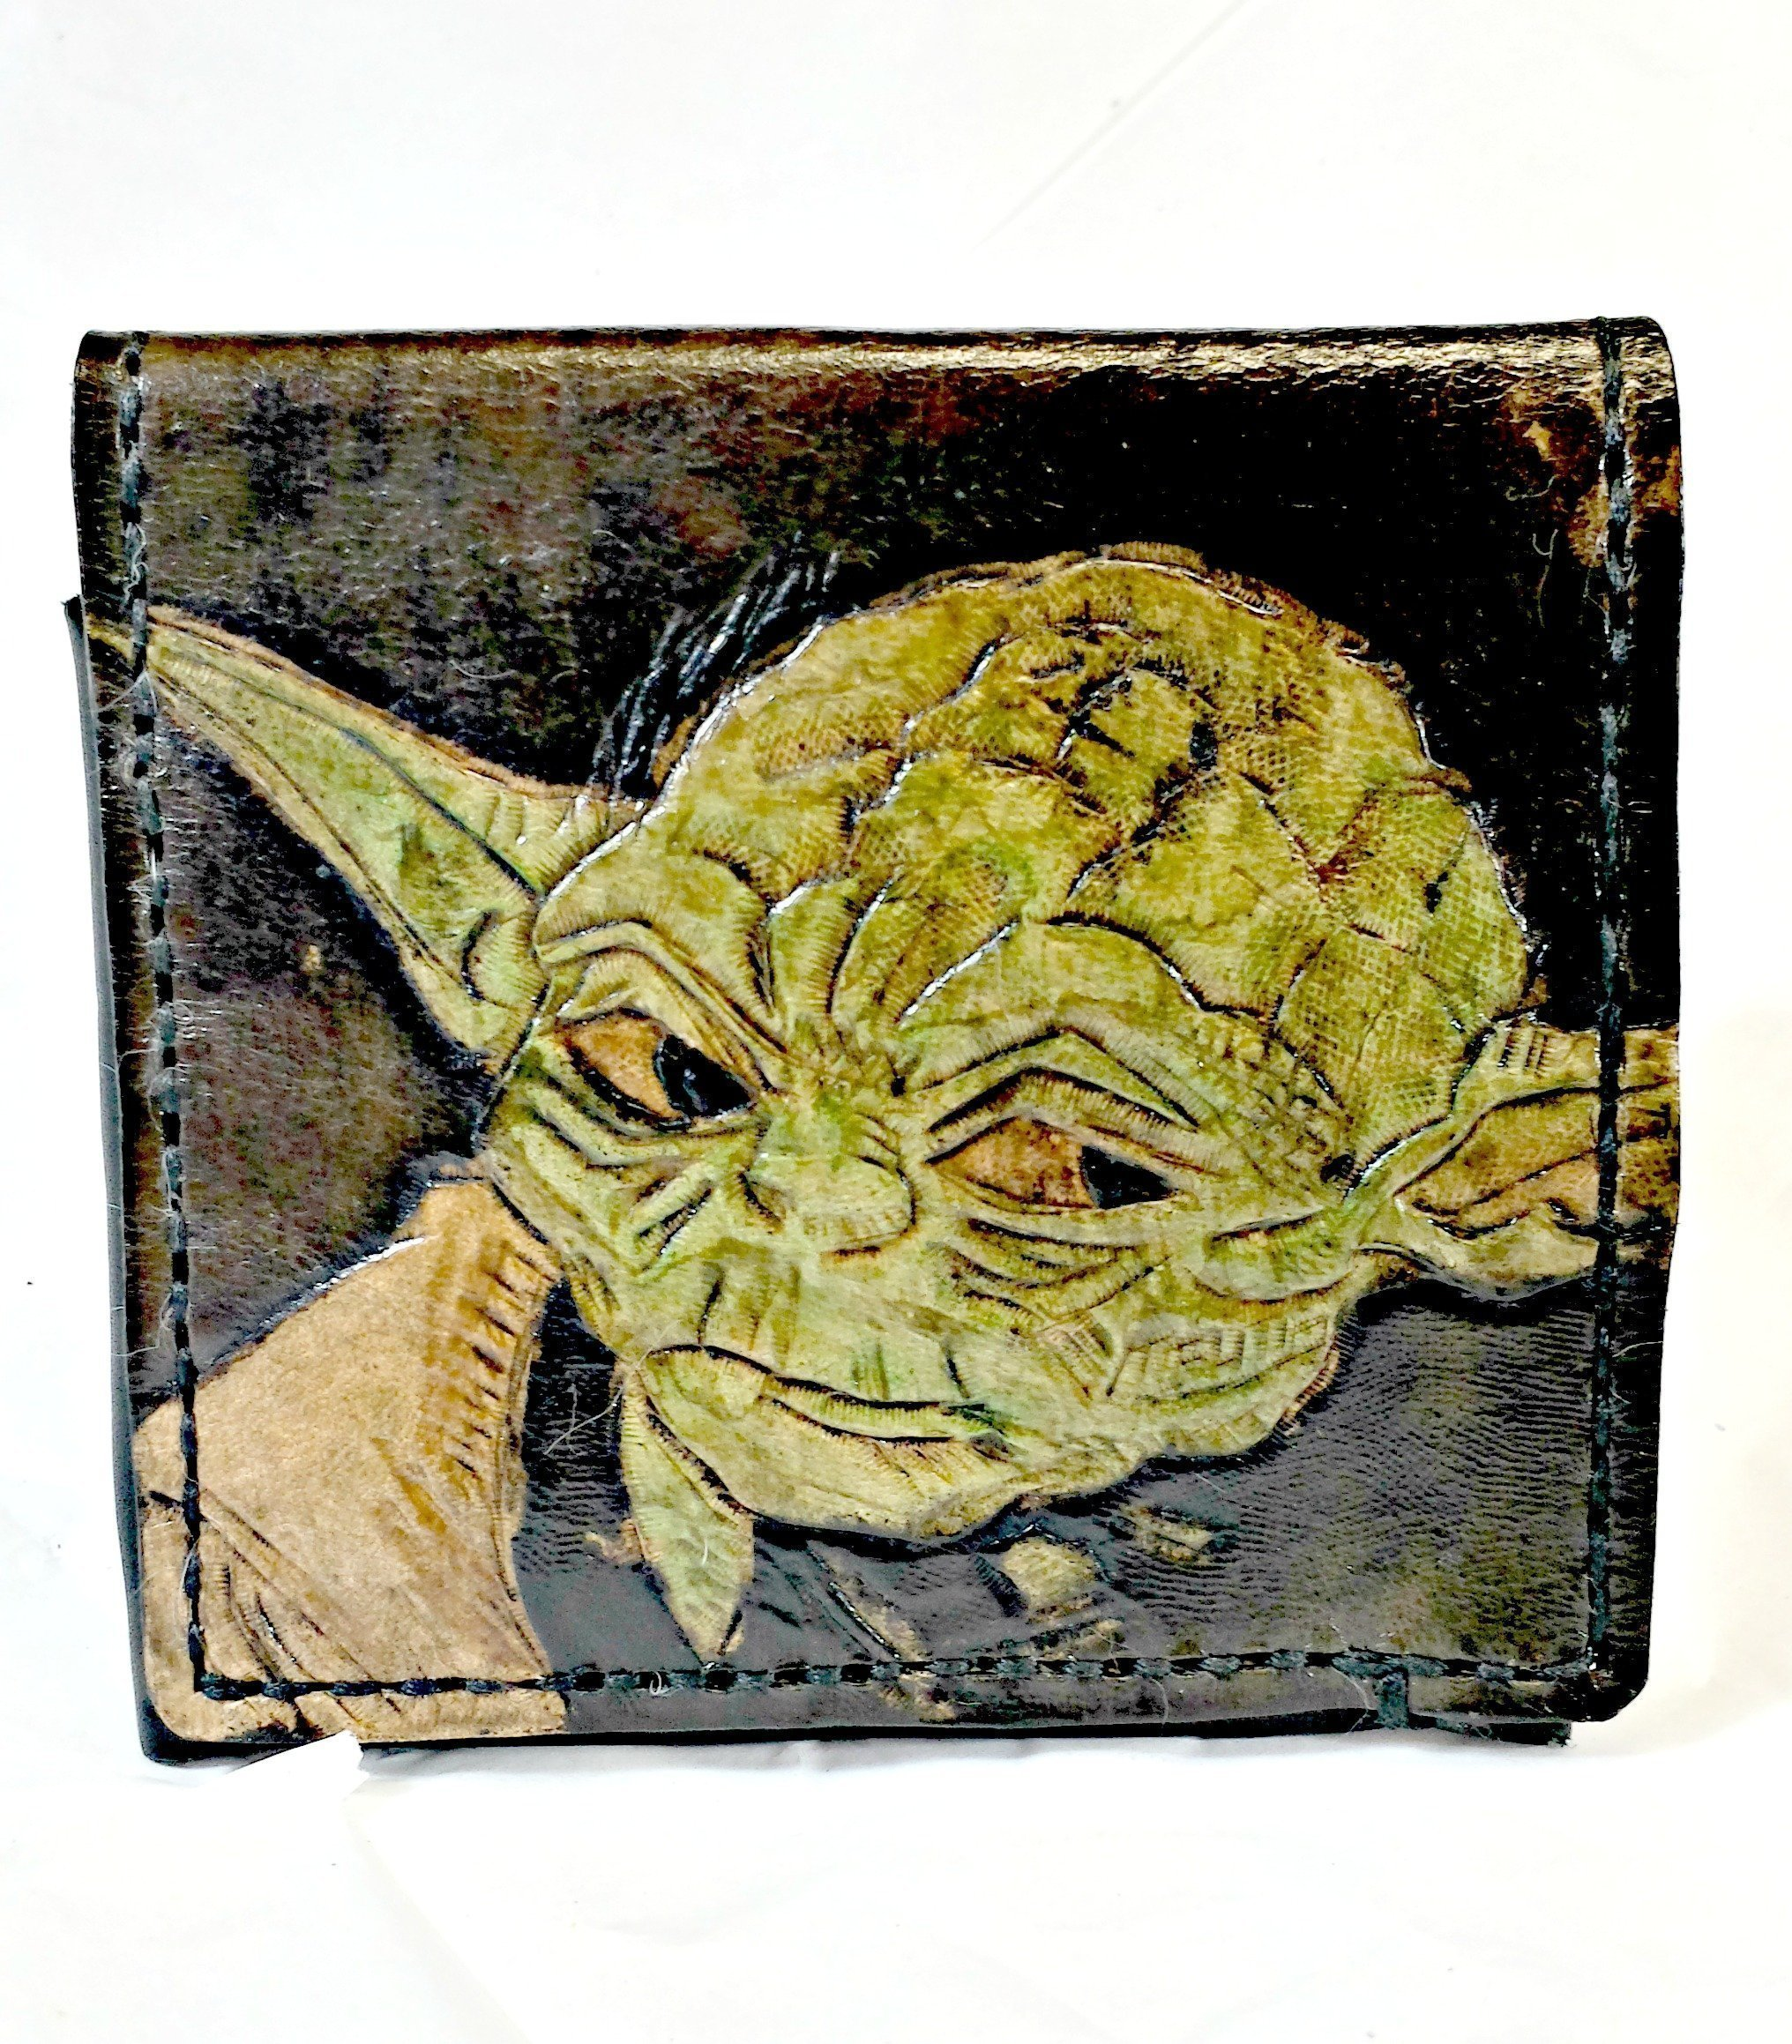 Handmade Leather Star Wars Yoda Wallet